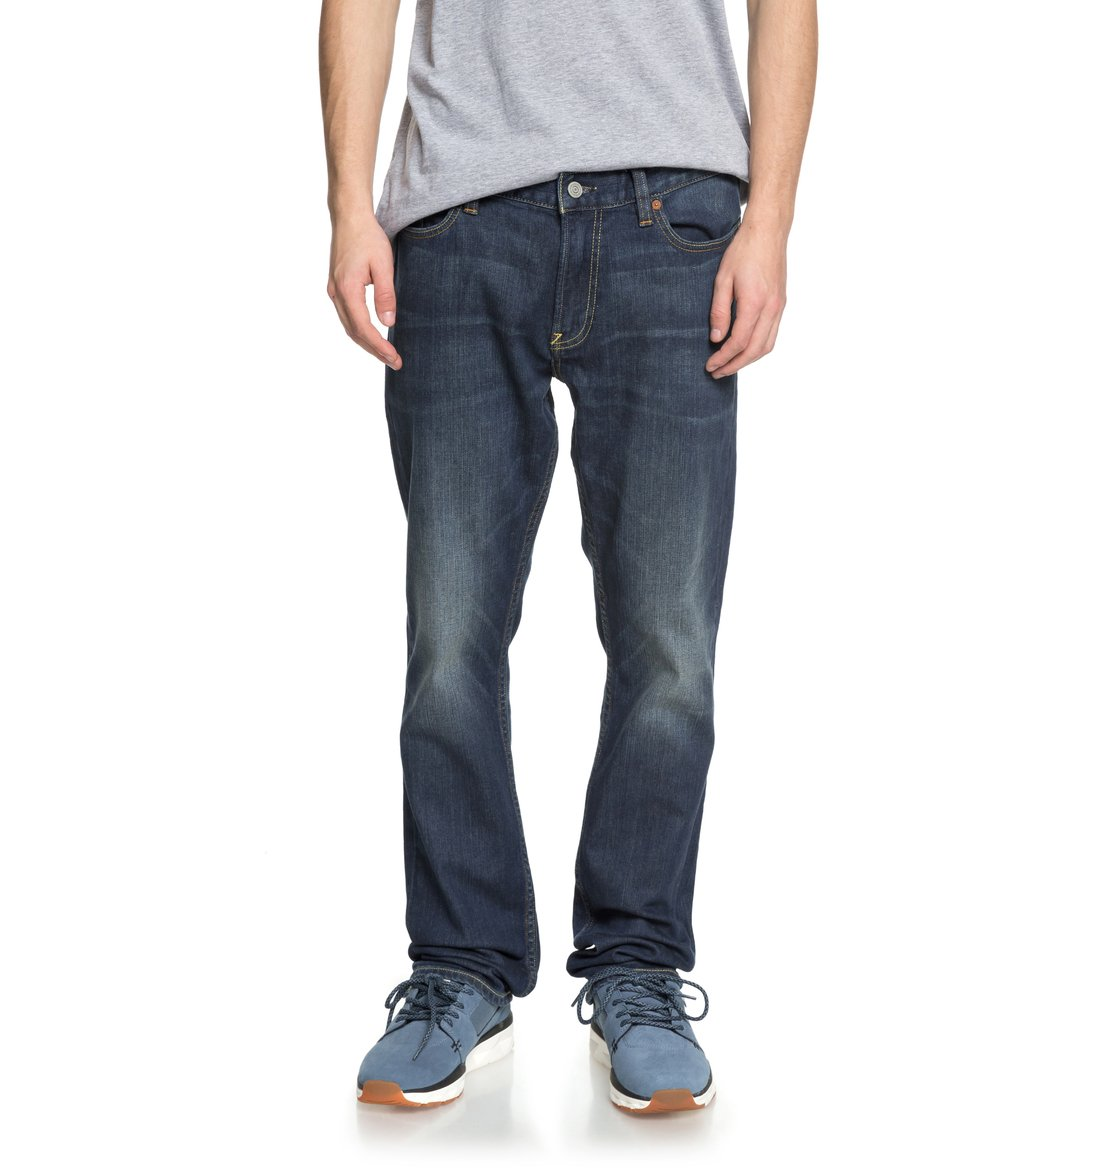 1c54d77d13 0 Worker Medium Stone Straight Fit Jeans EDYDP03365 DC Shoes